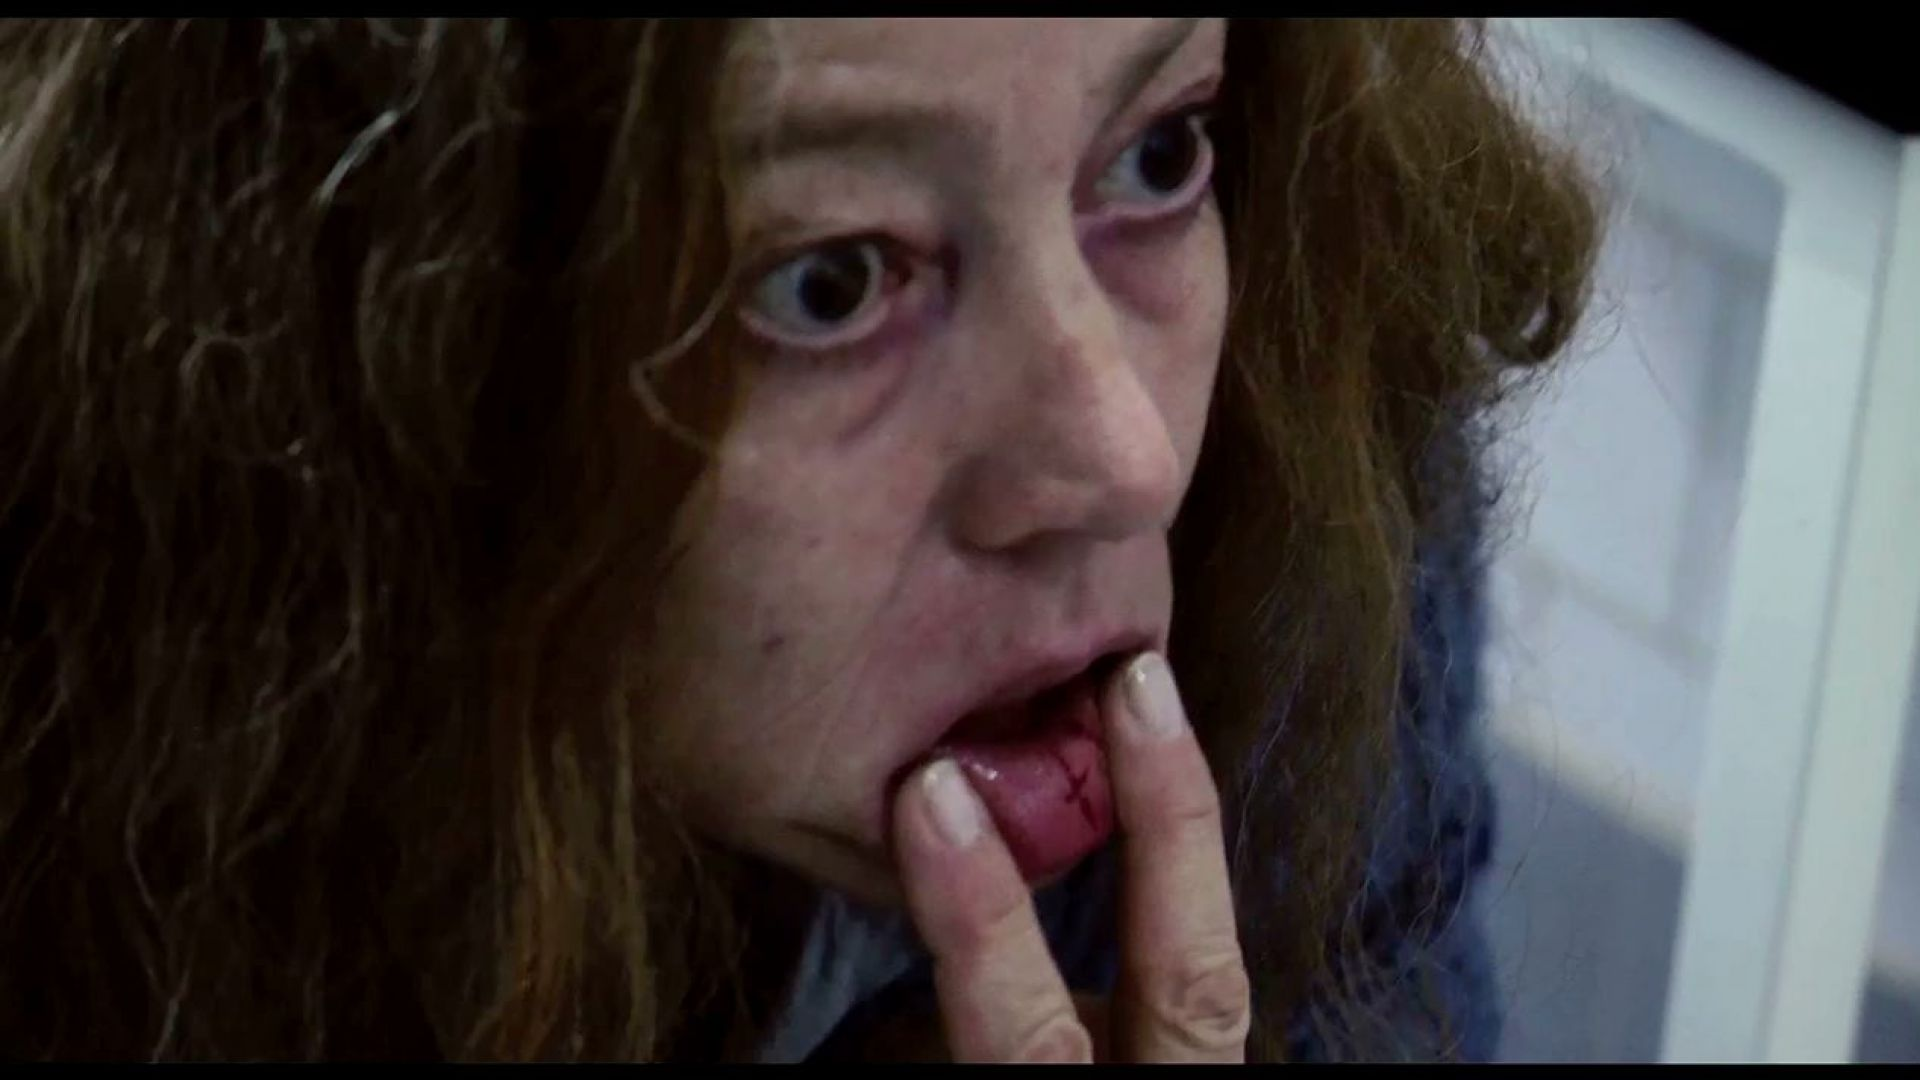 Maria Rossi 911 call, 1989